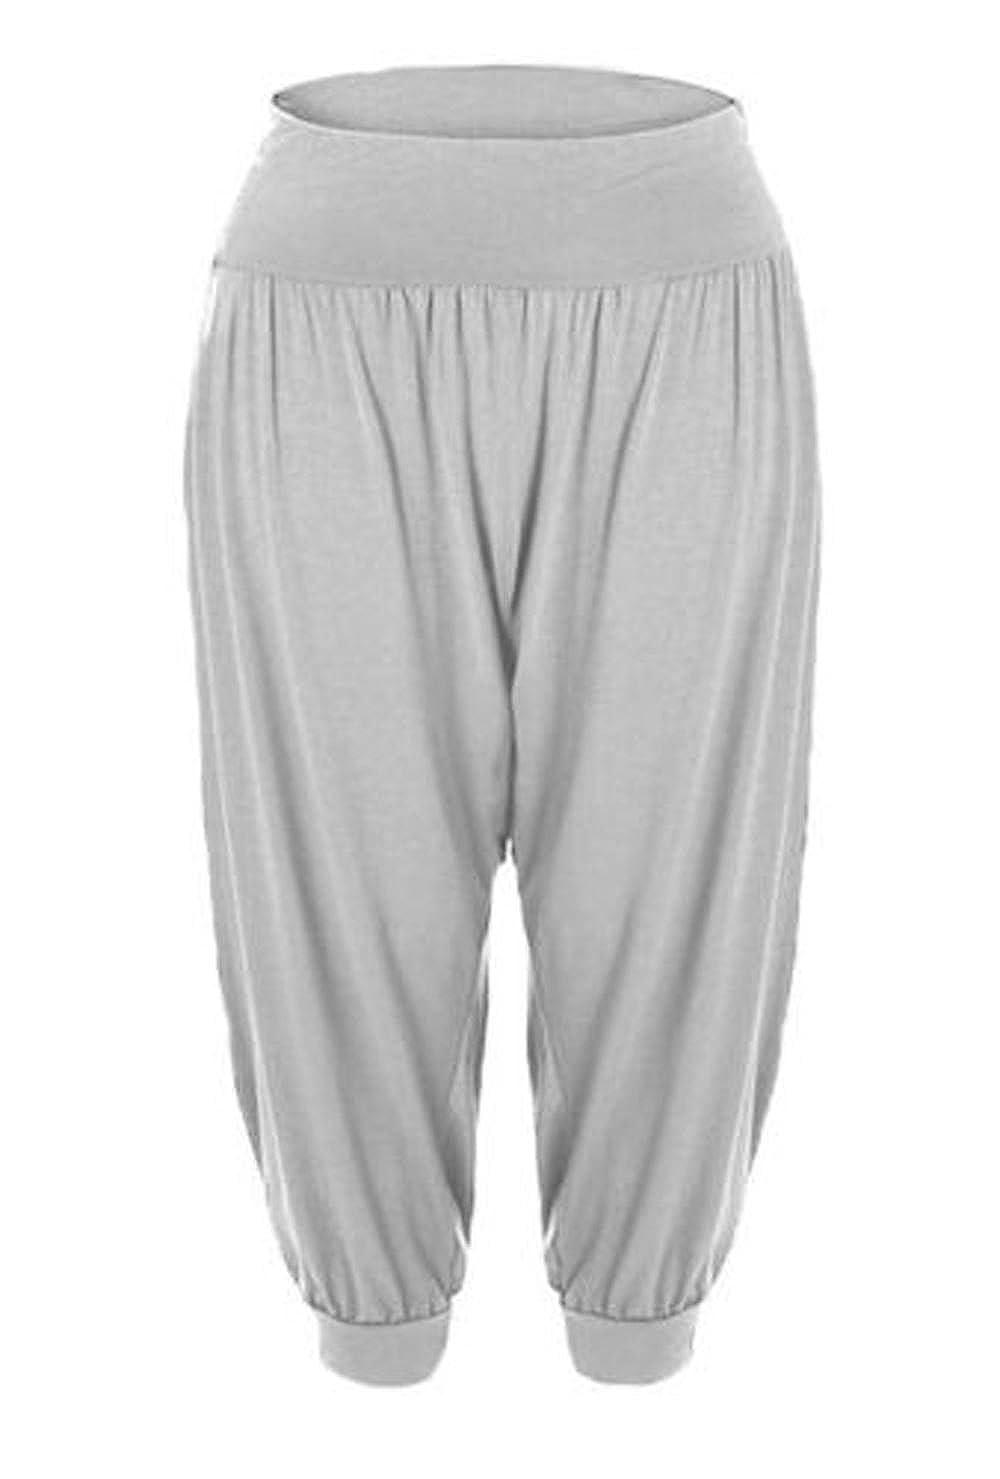 New Kids Girls Plain Hareem Baggy Alibaba Leggings Pants Stretchy Harem Trousers